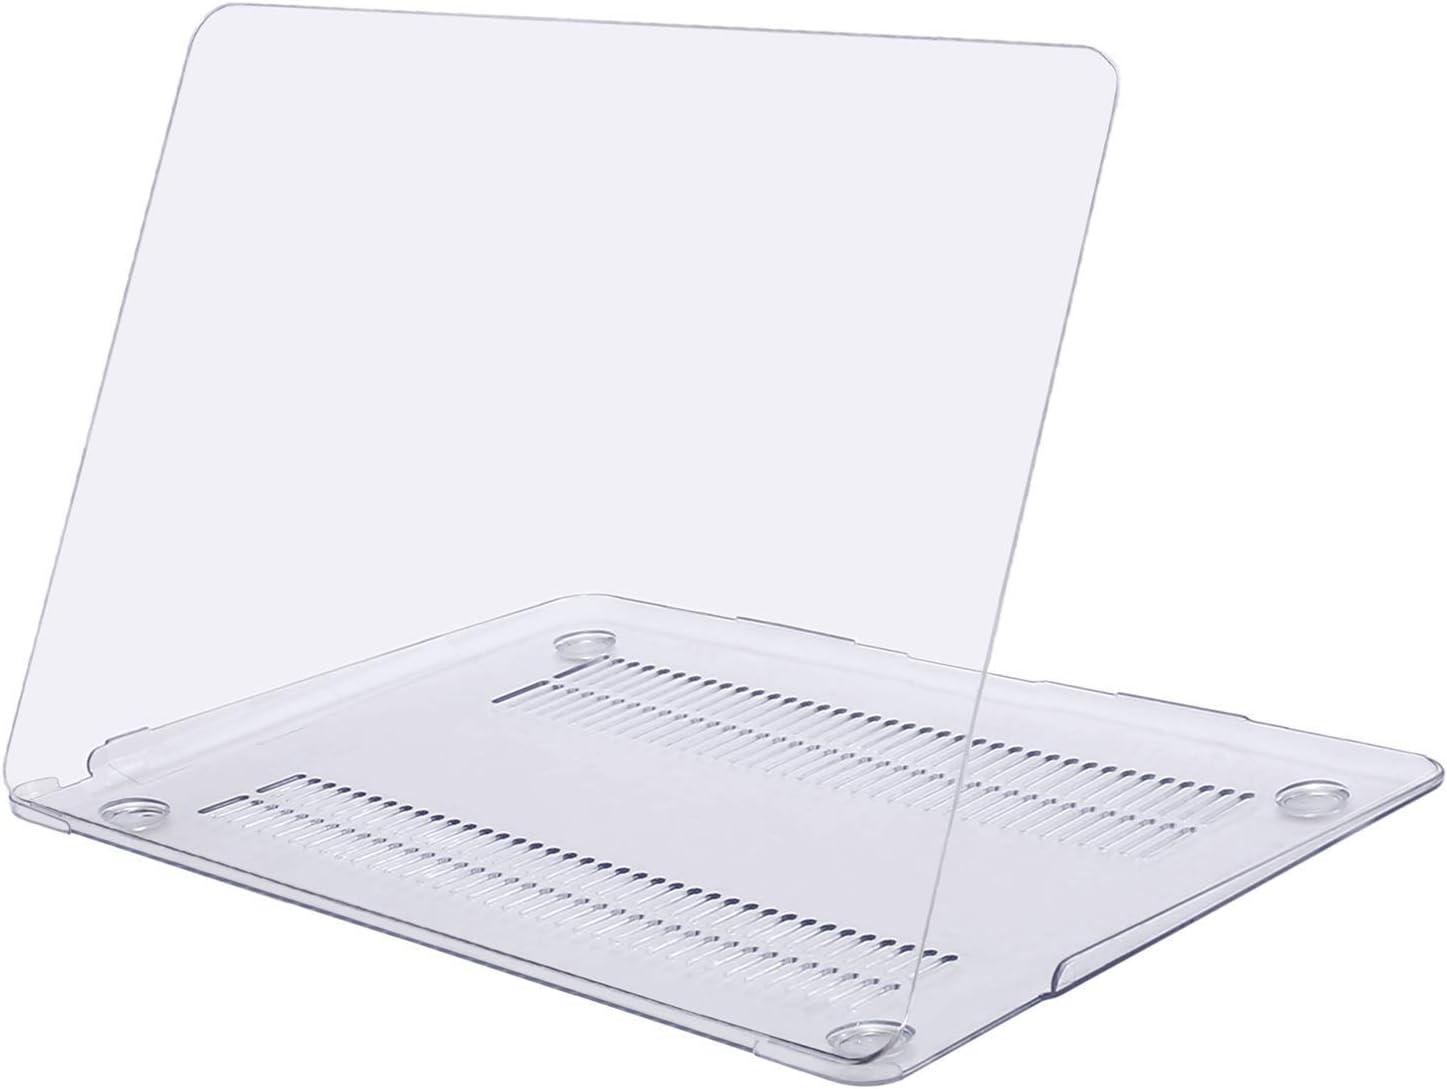 MOSISO Funda Dura Compatible con 2020-2018 MacBook Air 13 Pulgadas A2337 M1 A2179 A1932 con Pantalla Retina & Touch ID,Ultra Delgado Carcasa Rígida Protector de Plástico Cubierta,Cristal